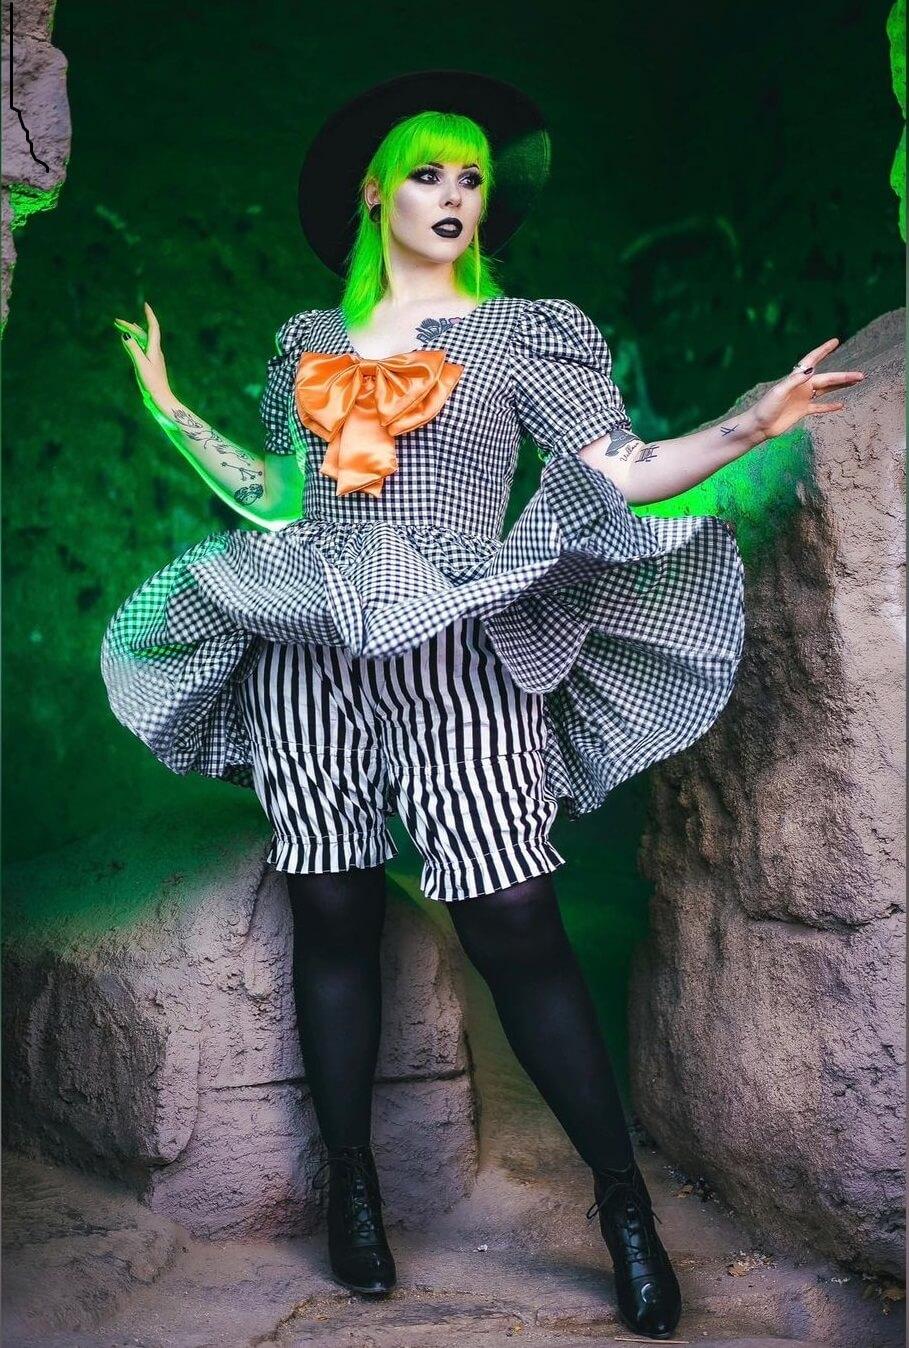 Halloween Costumes for Women Haunted Tea Party Themed Halloween Costume